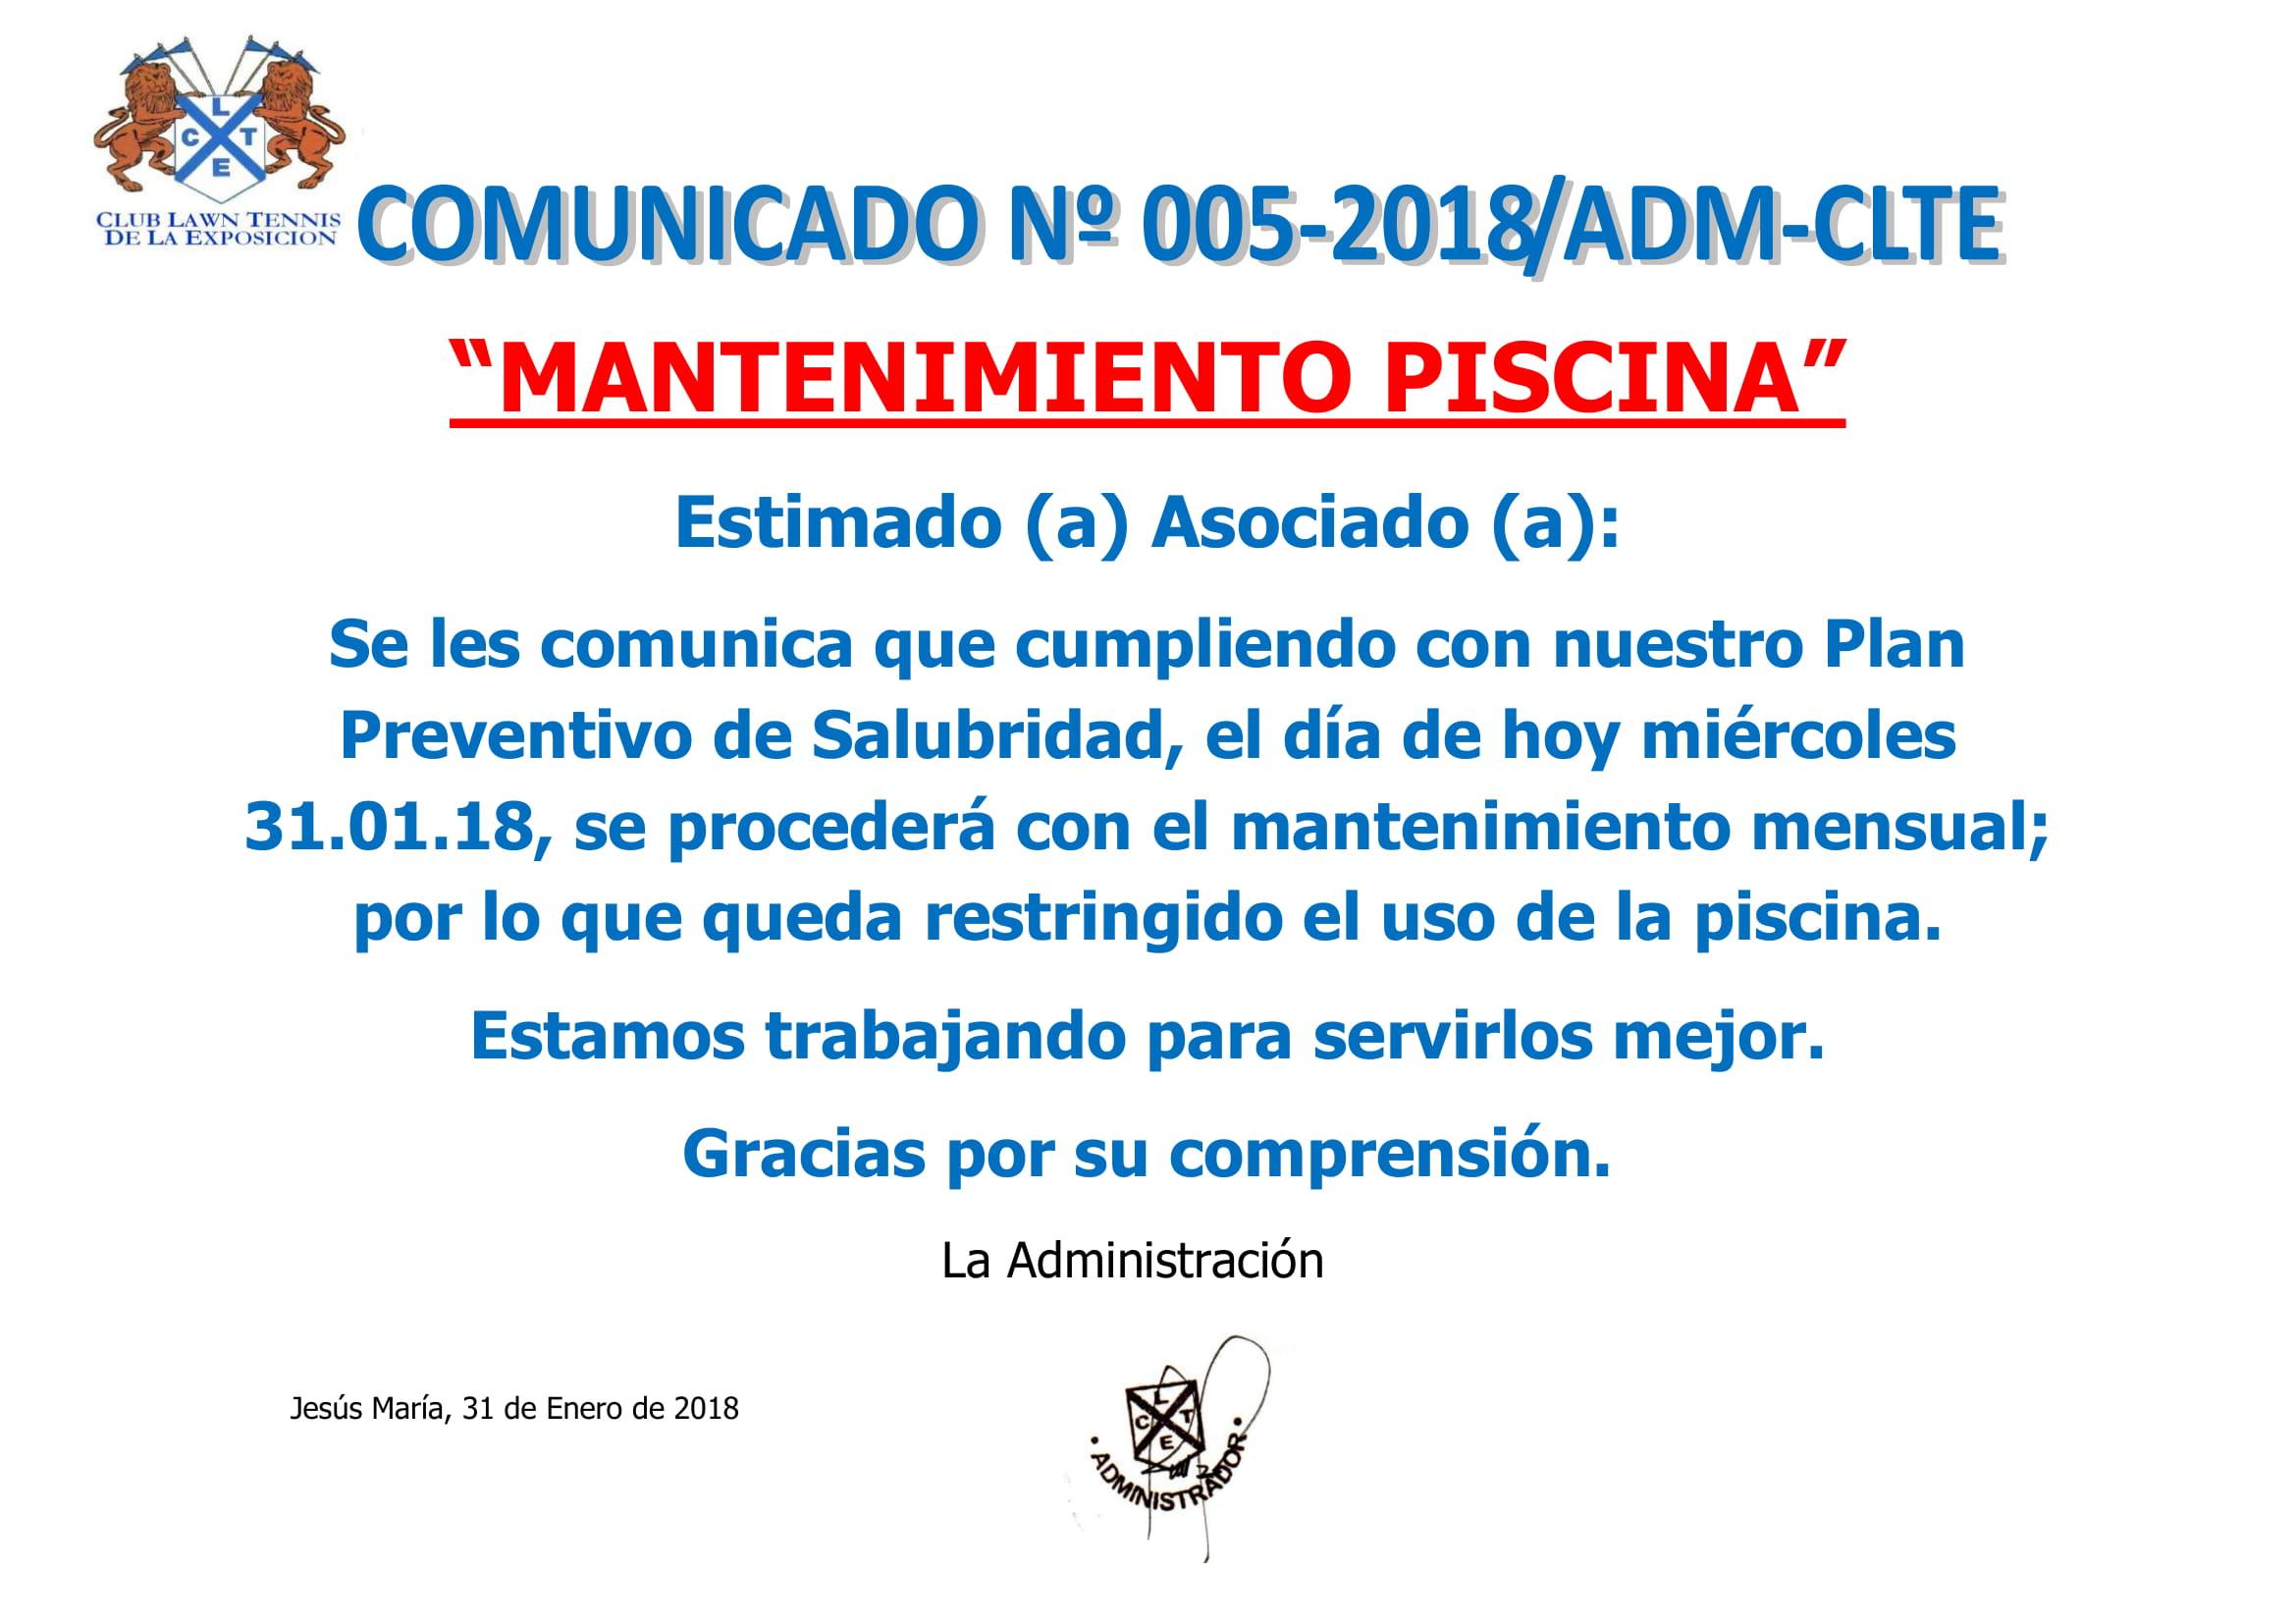 Comunicado 005-2018 ADM-CLTE - MANTENIMIENTO PISCINA